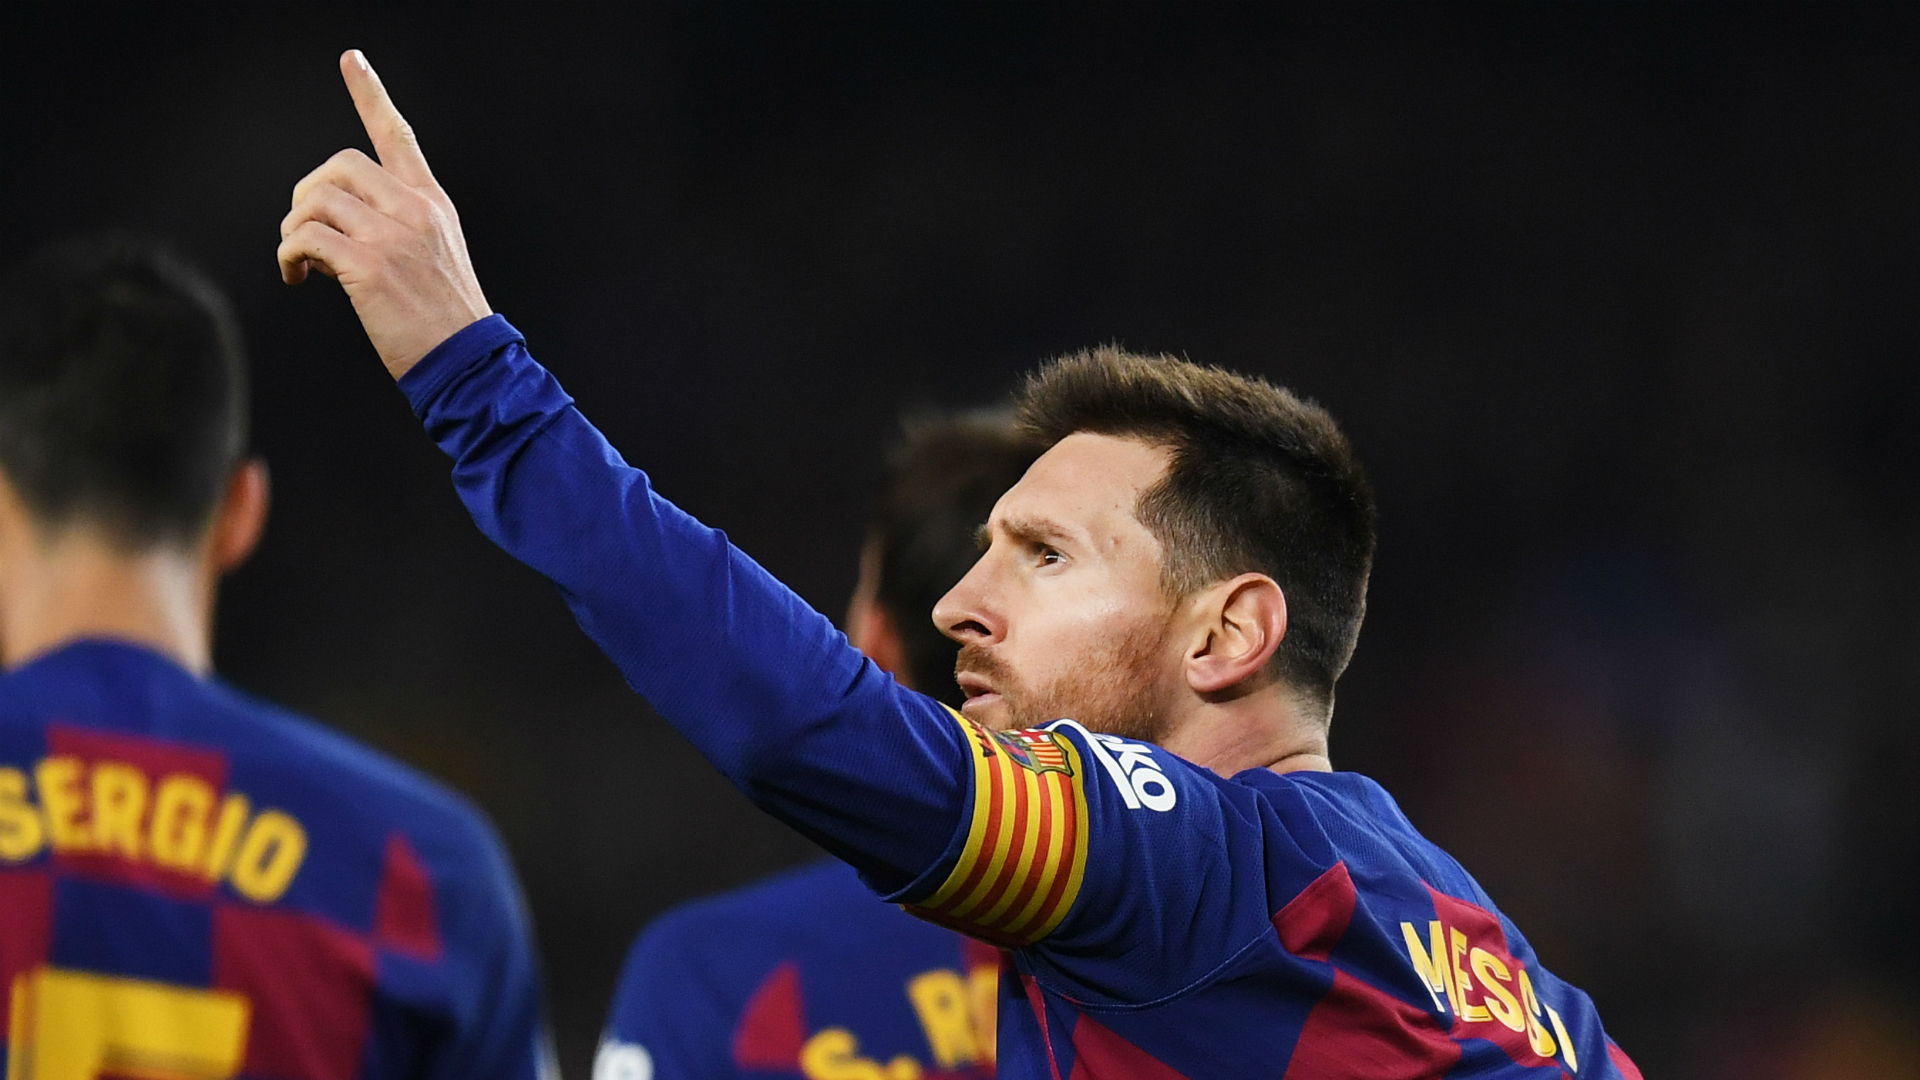 Barcelona 5-2 Real Mallorca: Messi scores hat-trick as champions regain top spot